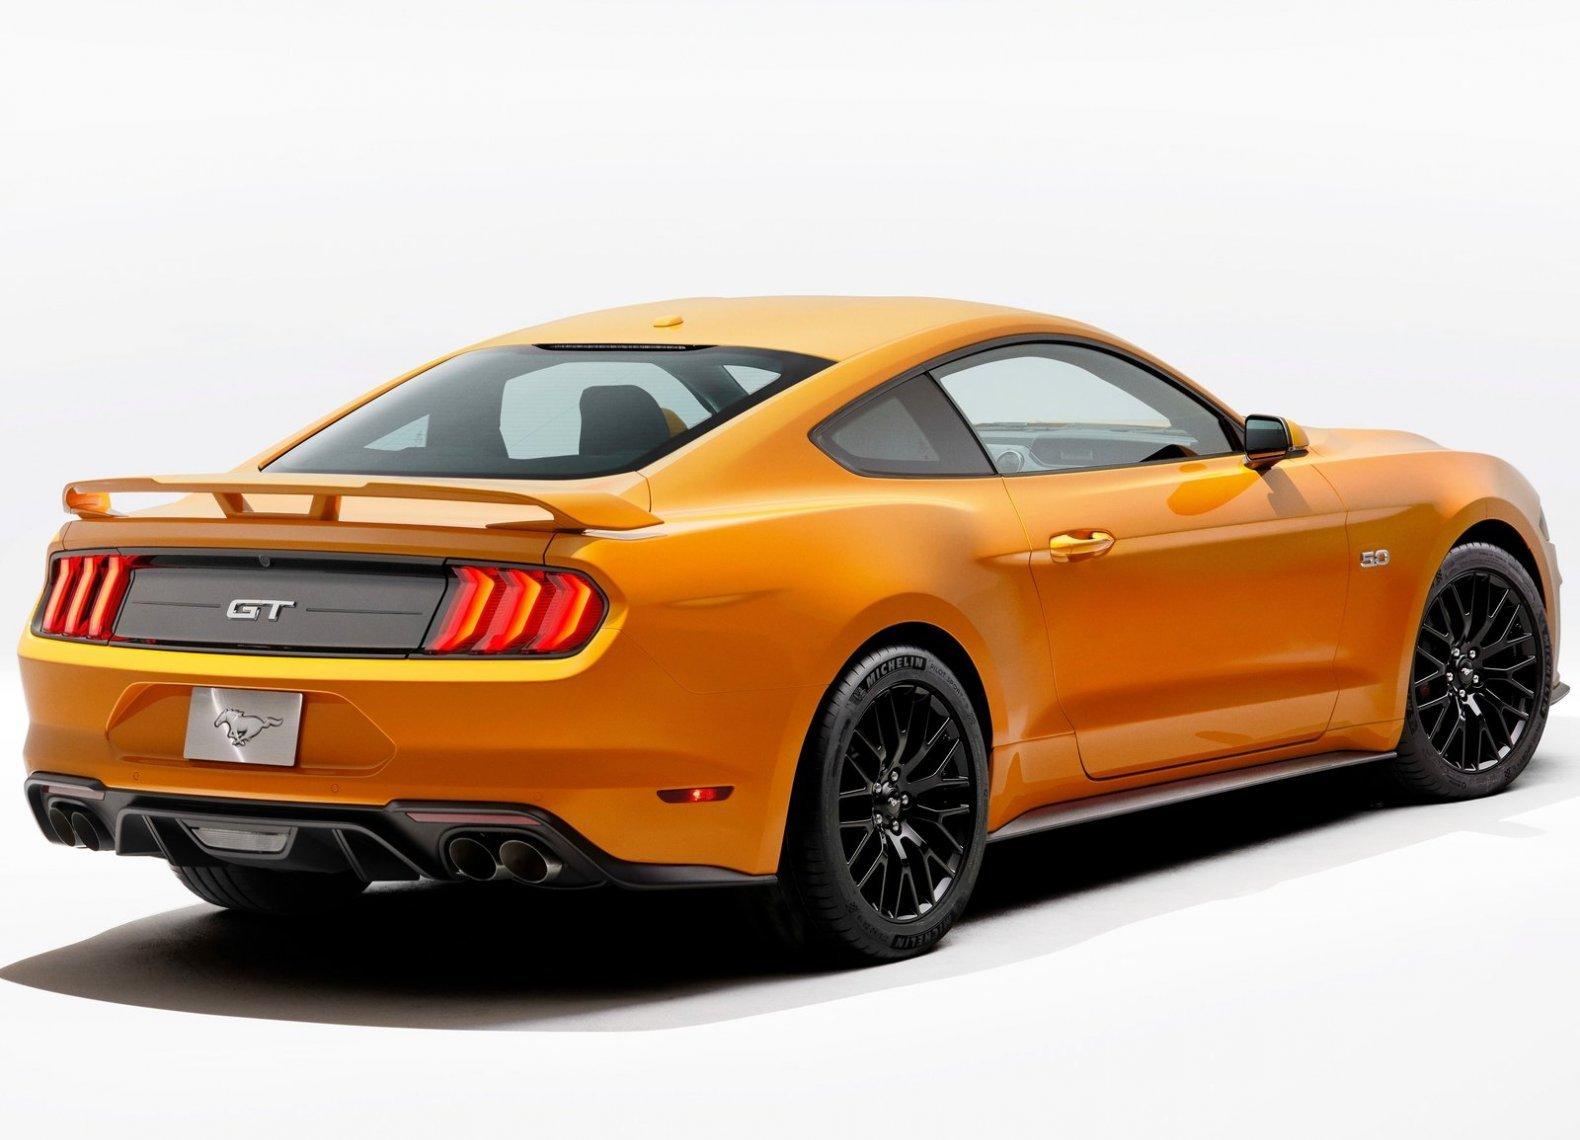 Ford Mustang GT стал мощнее на 19 лошадиных сил